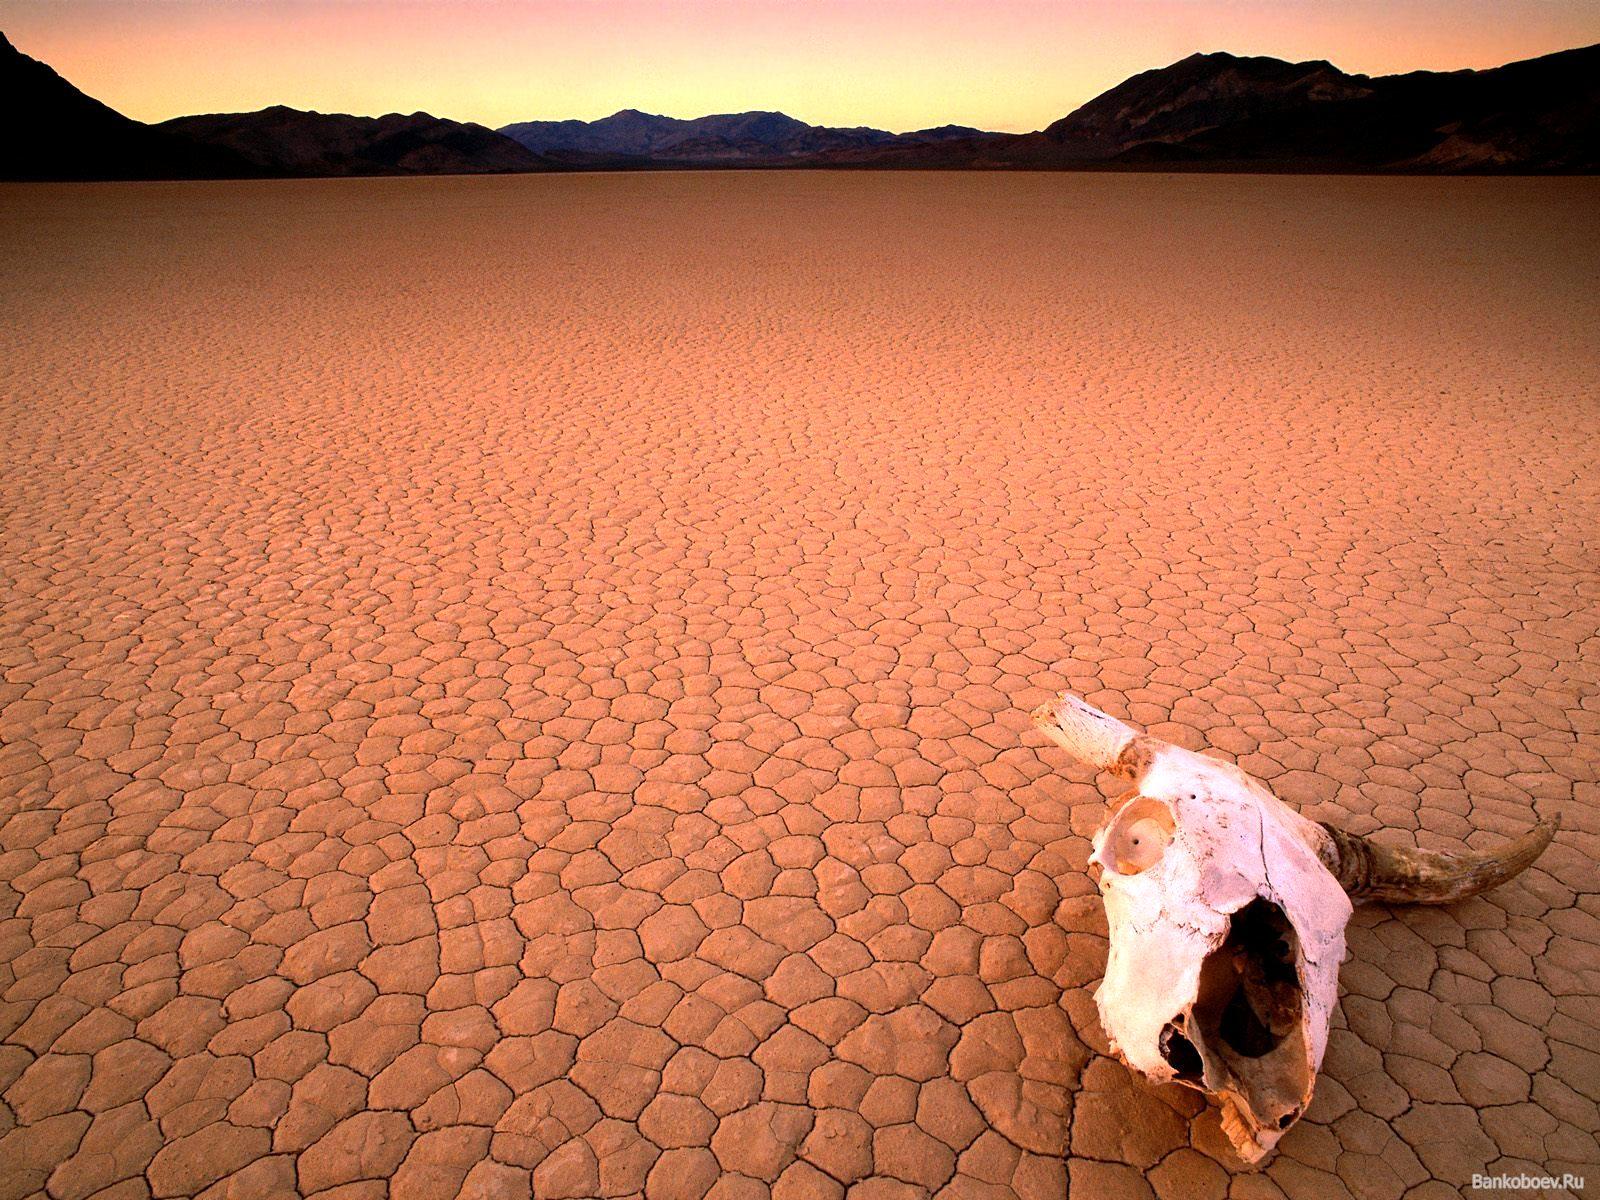 Wüstenei